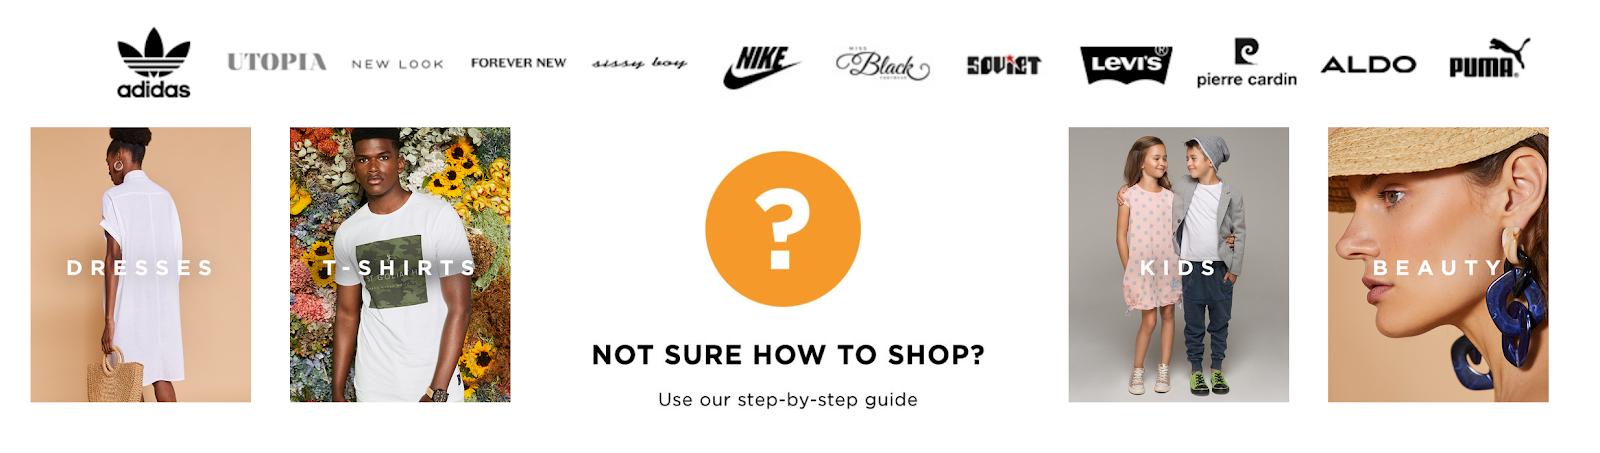 ZANDO: Ultimate Online Shopping Experience